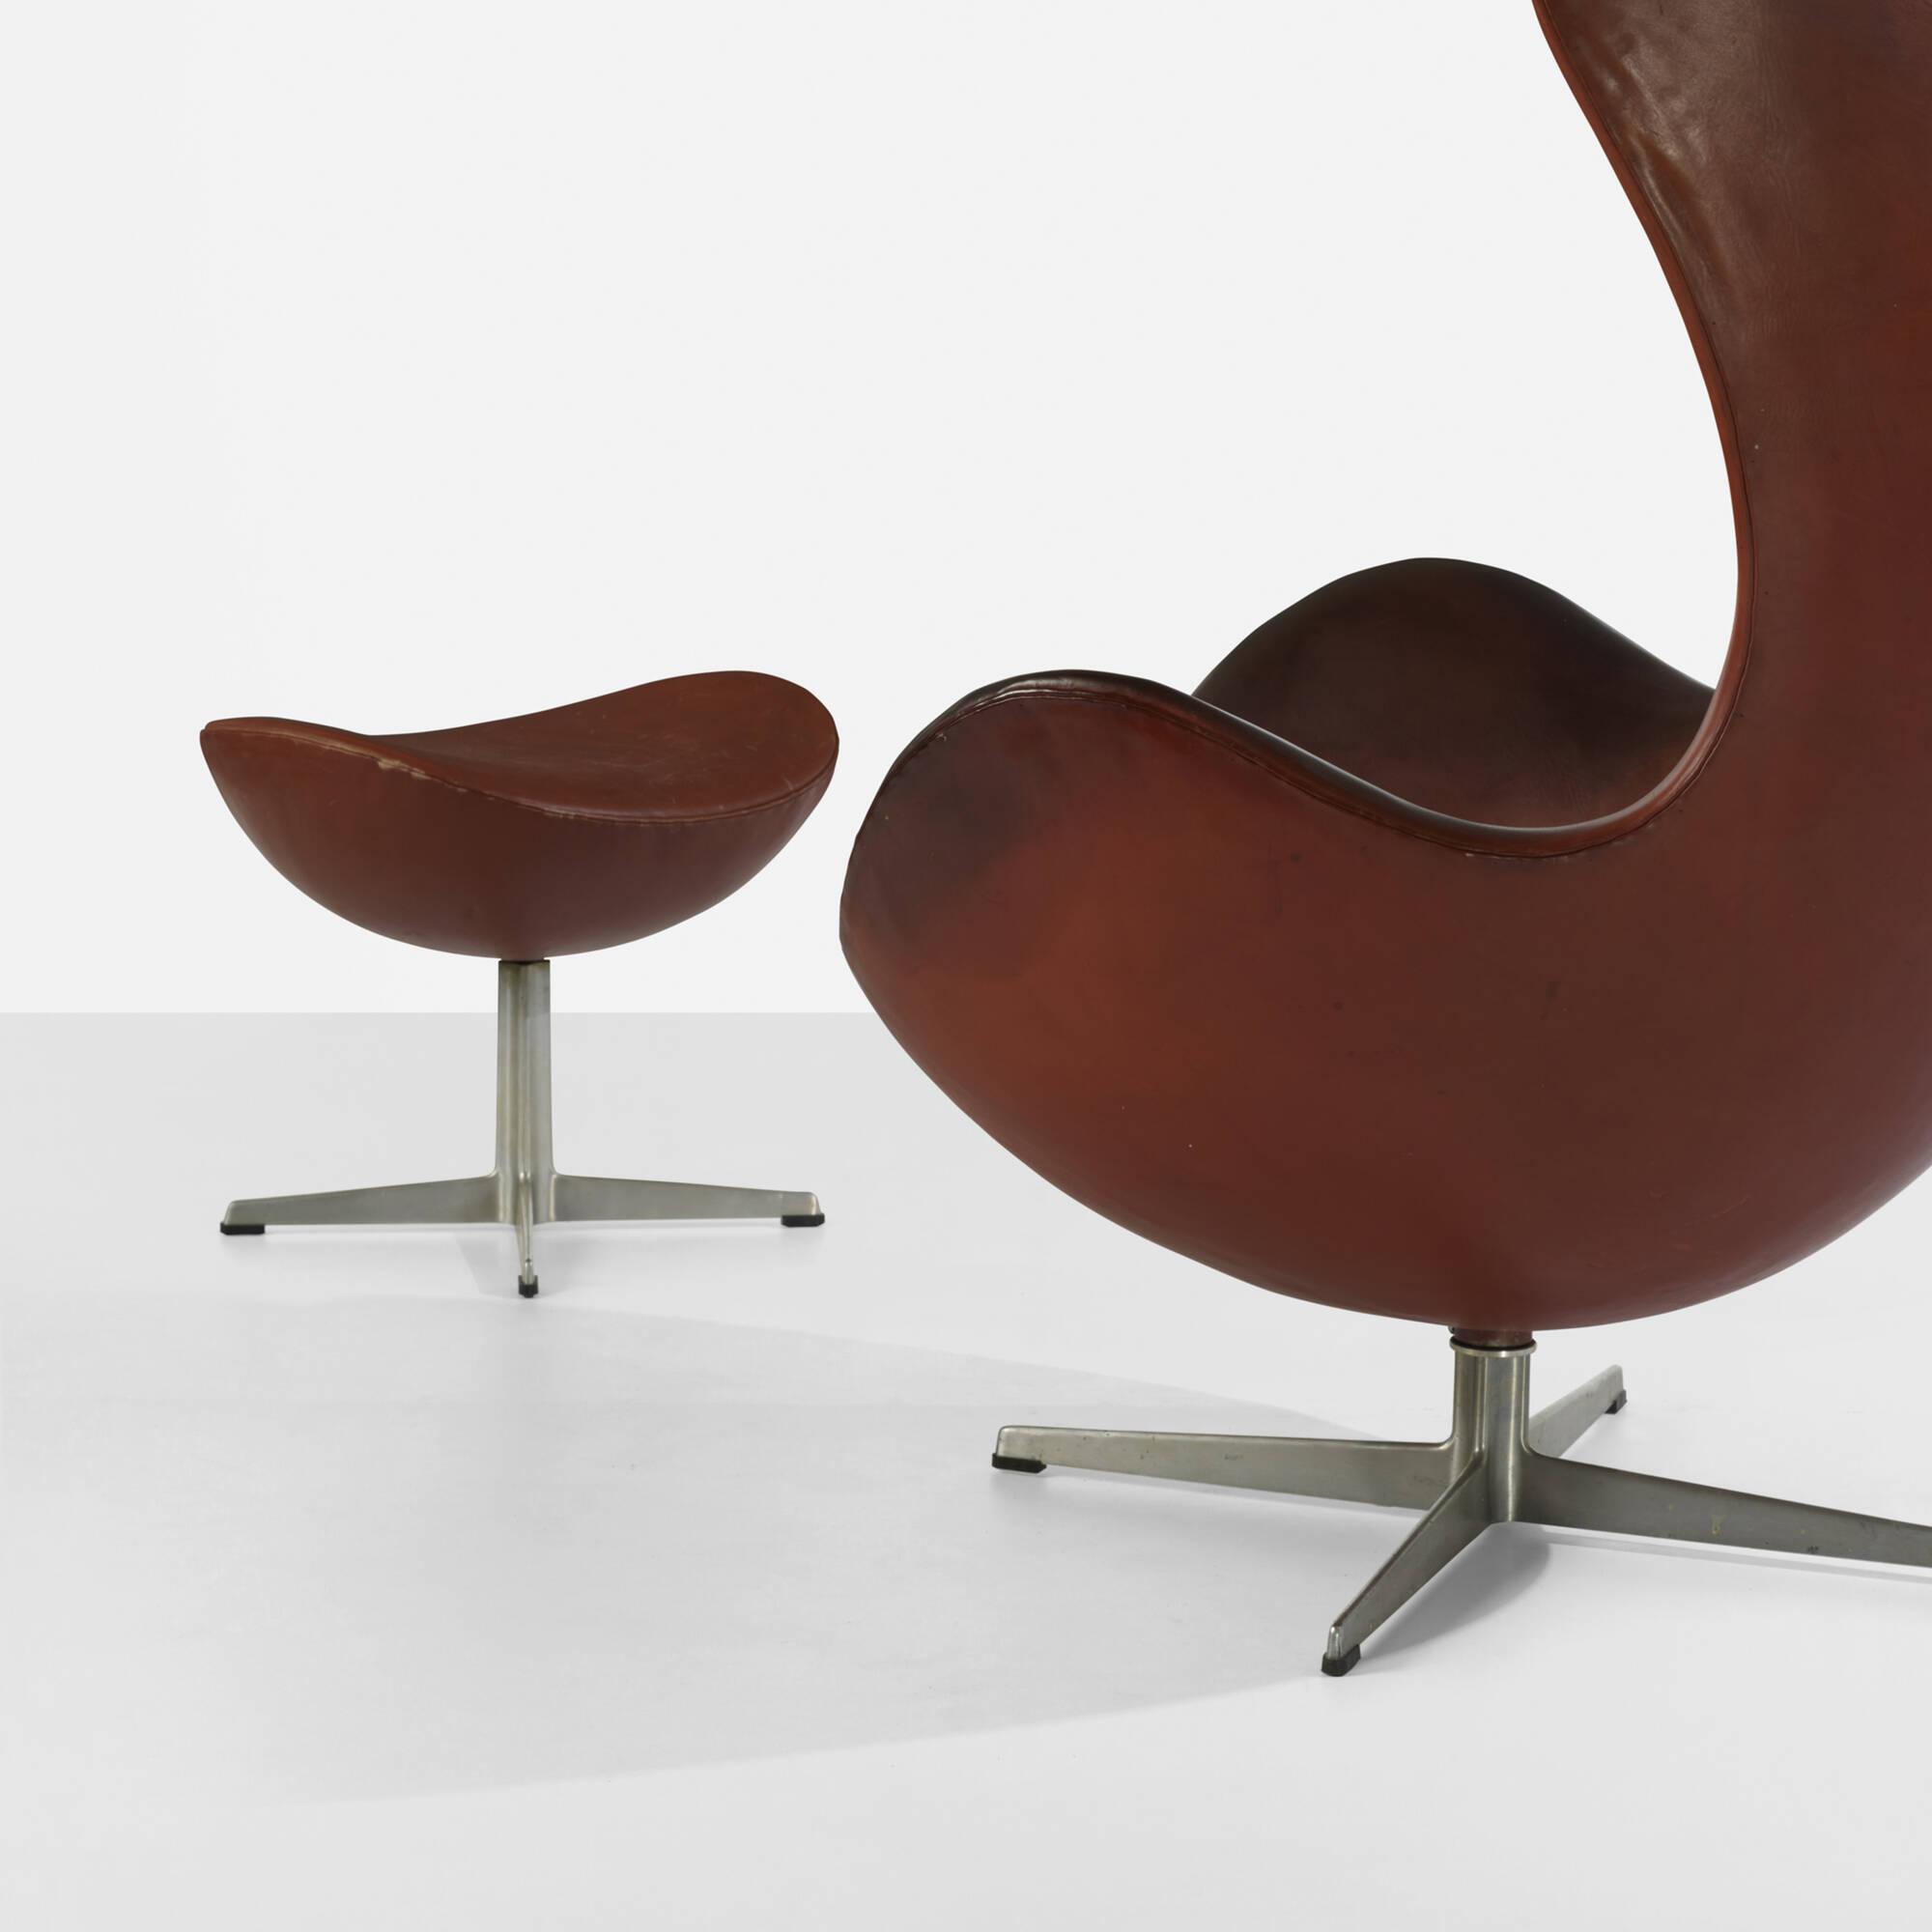 ... 189: Arne Jacobsen / Egg Chair And Ottoman (5 Of 6)